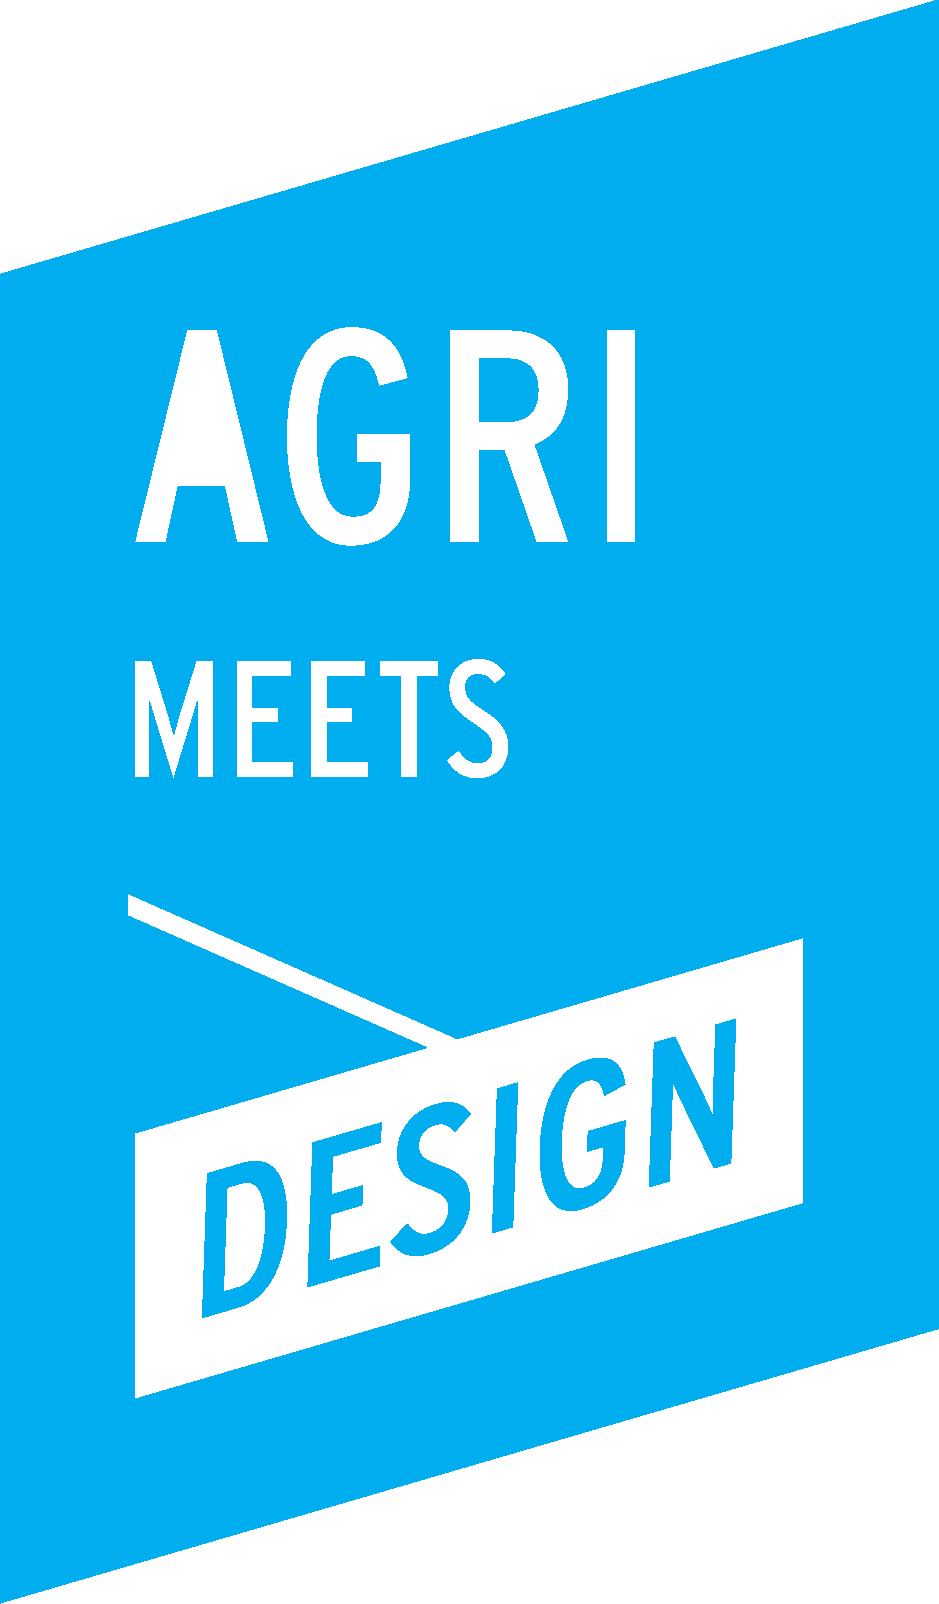 Agri meets Design